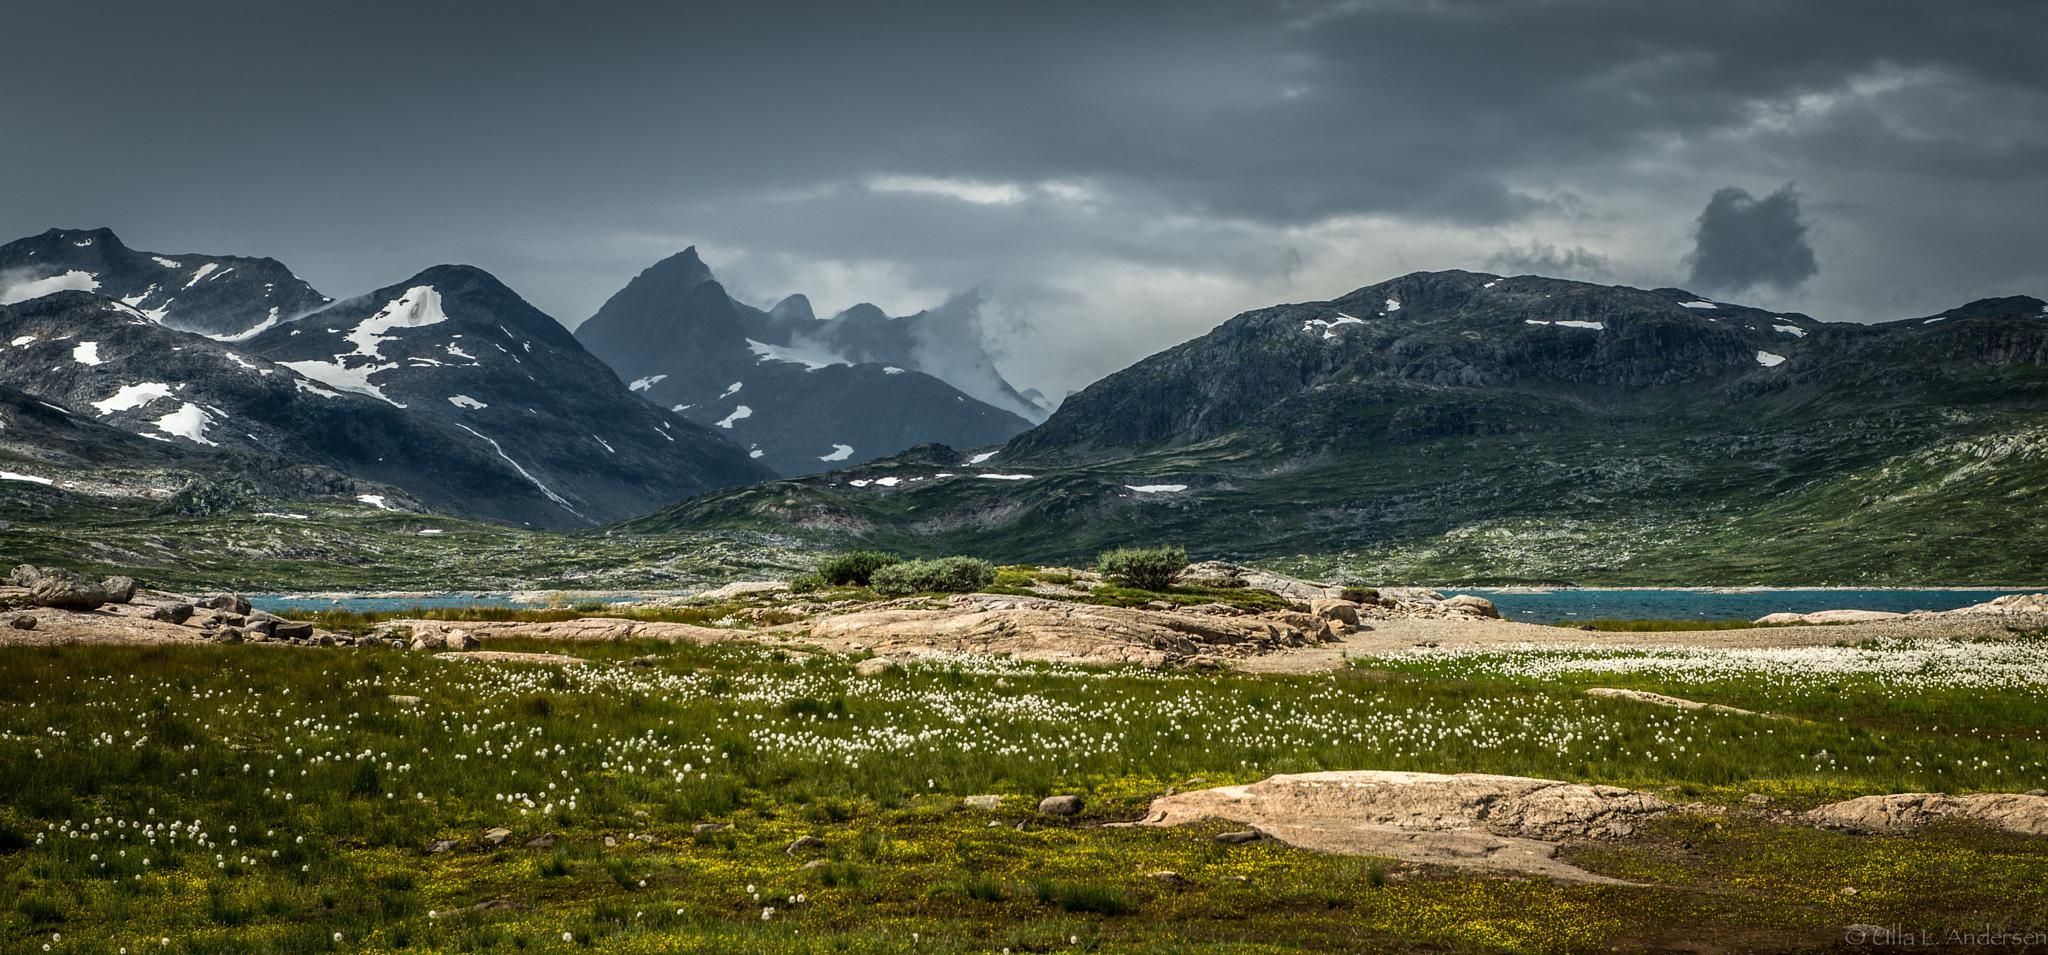 Mountains in Norway by Ulla Lippert Andersen